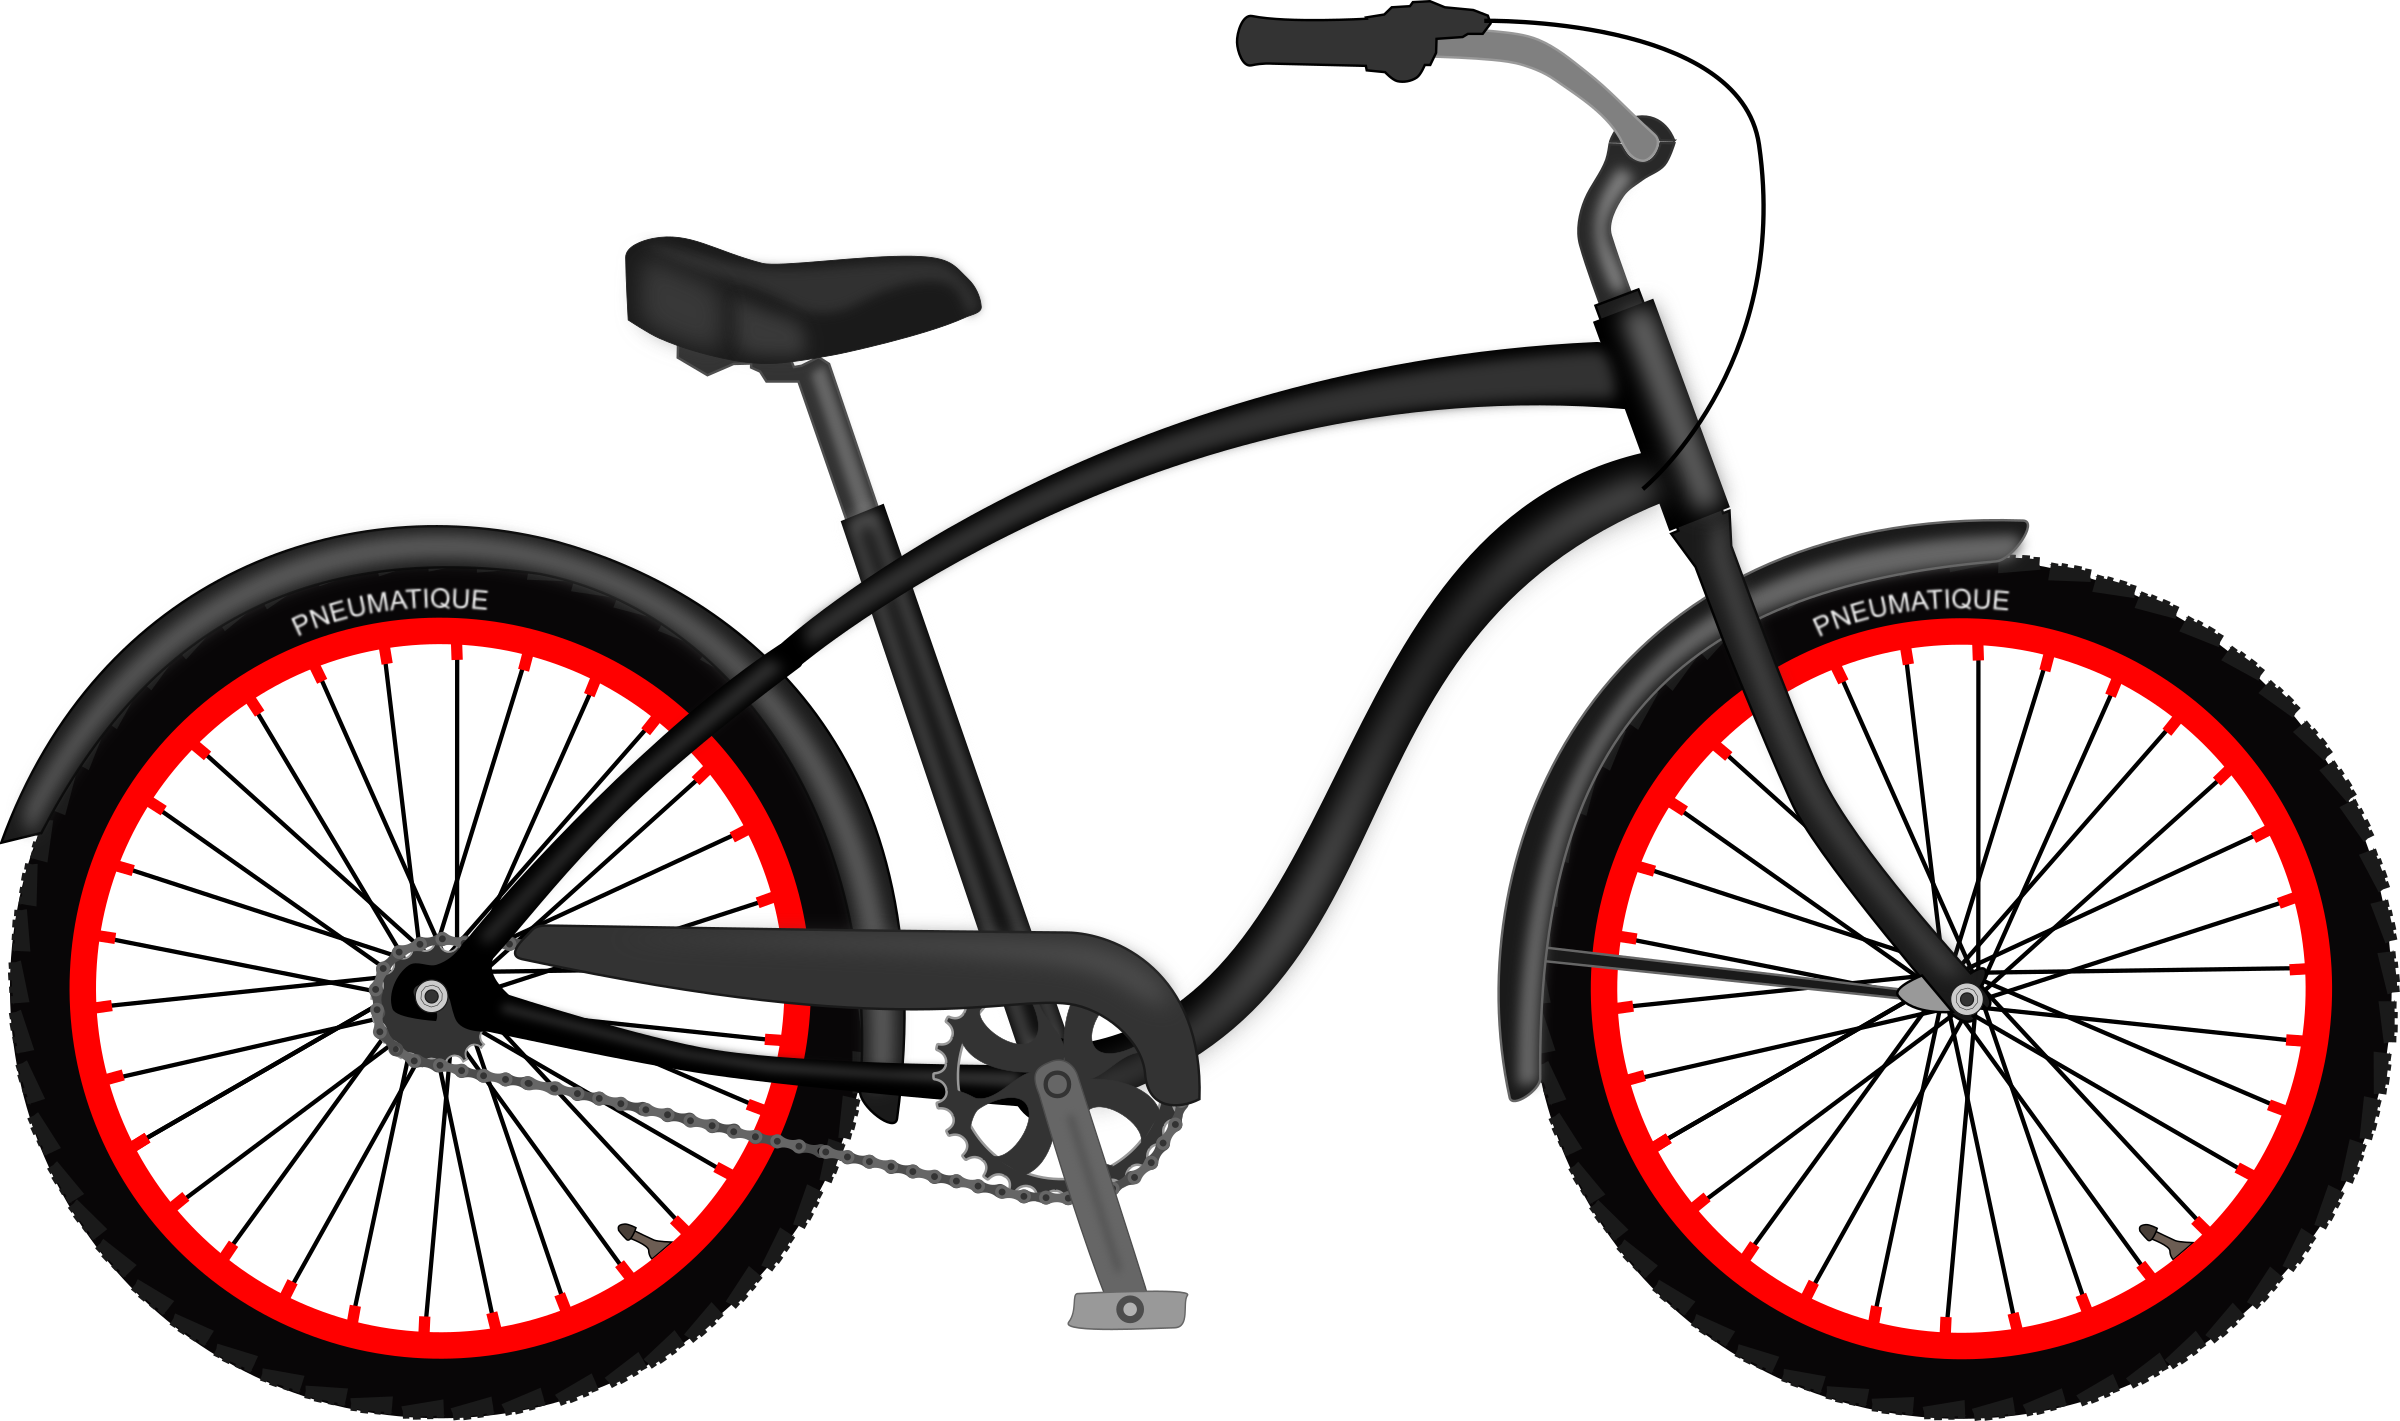 Cycle clipart beach bike, Cycle beach bike Transparent FREE.